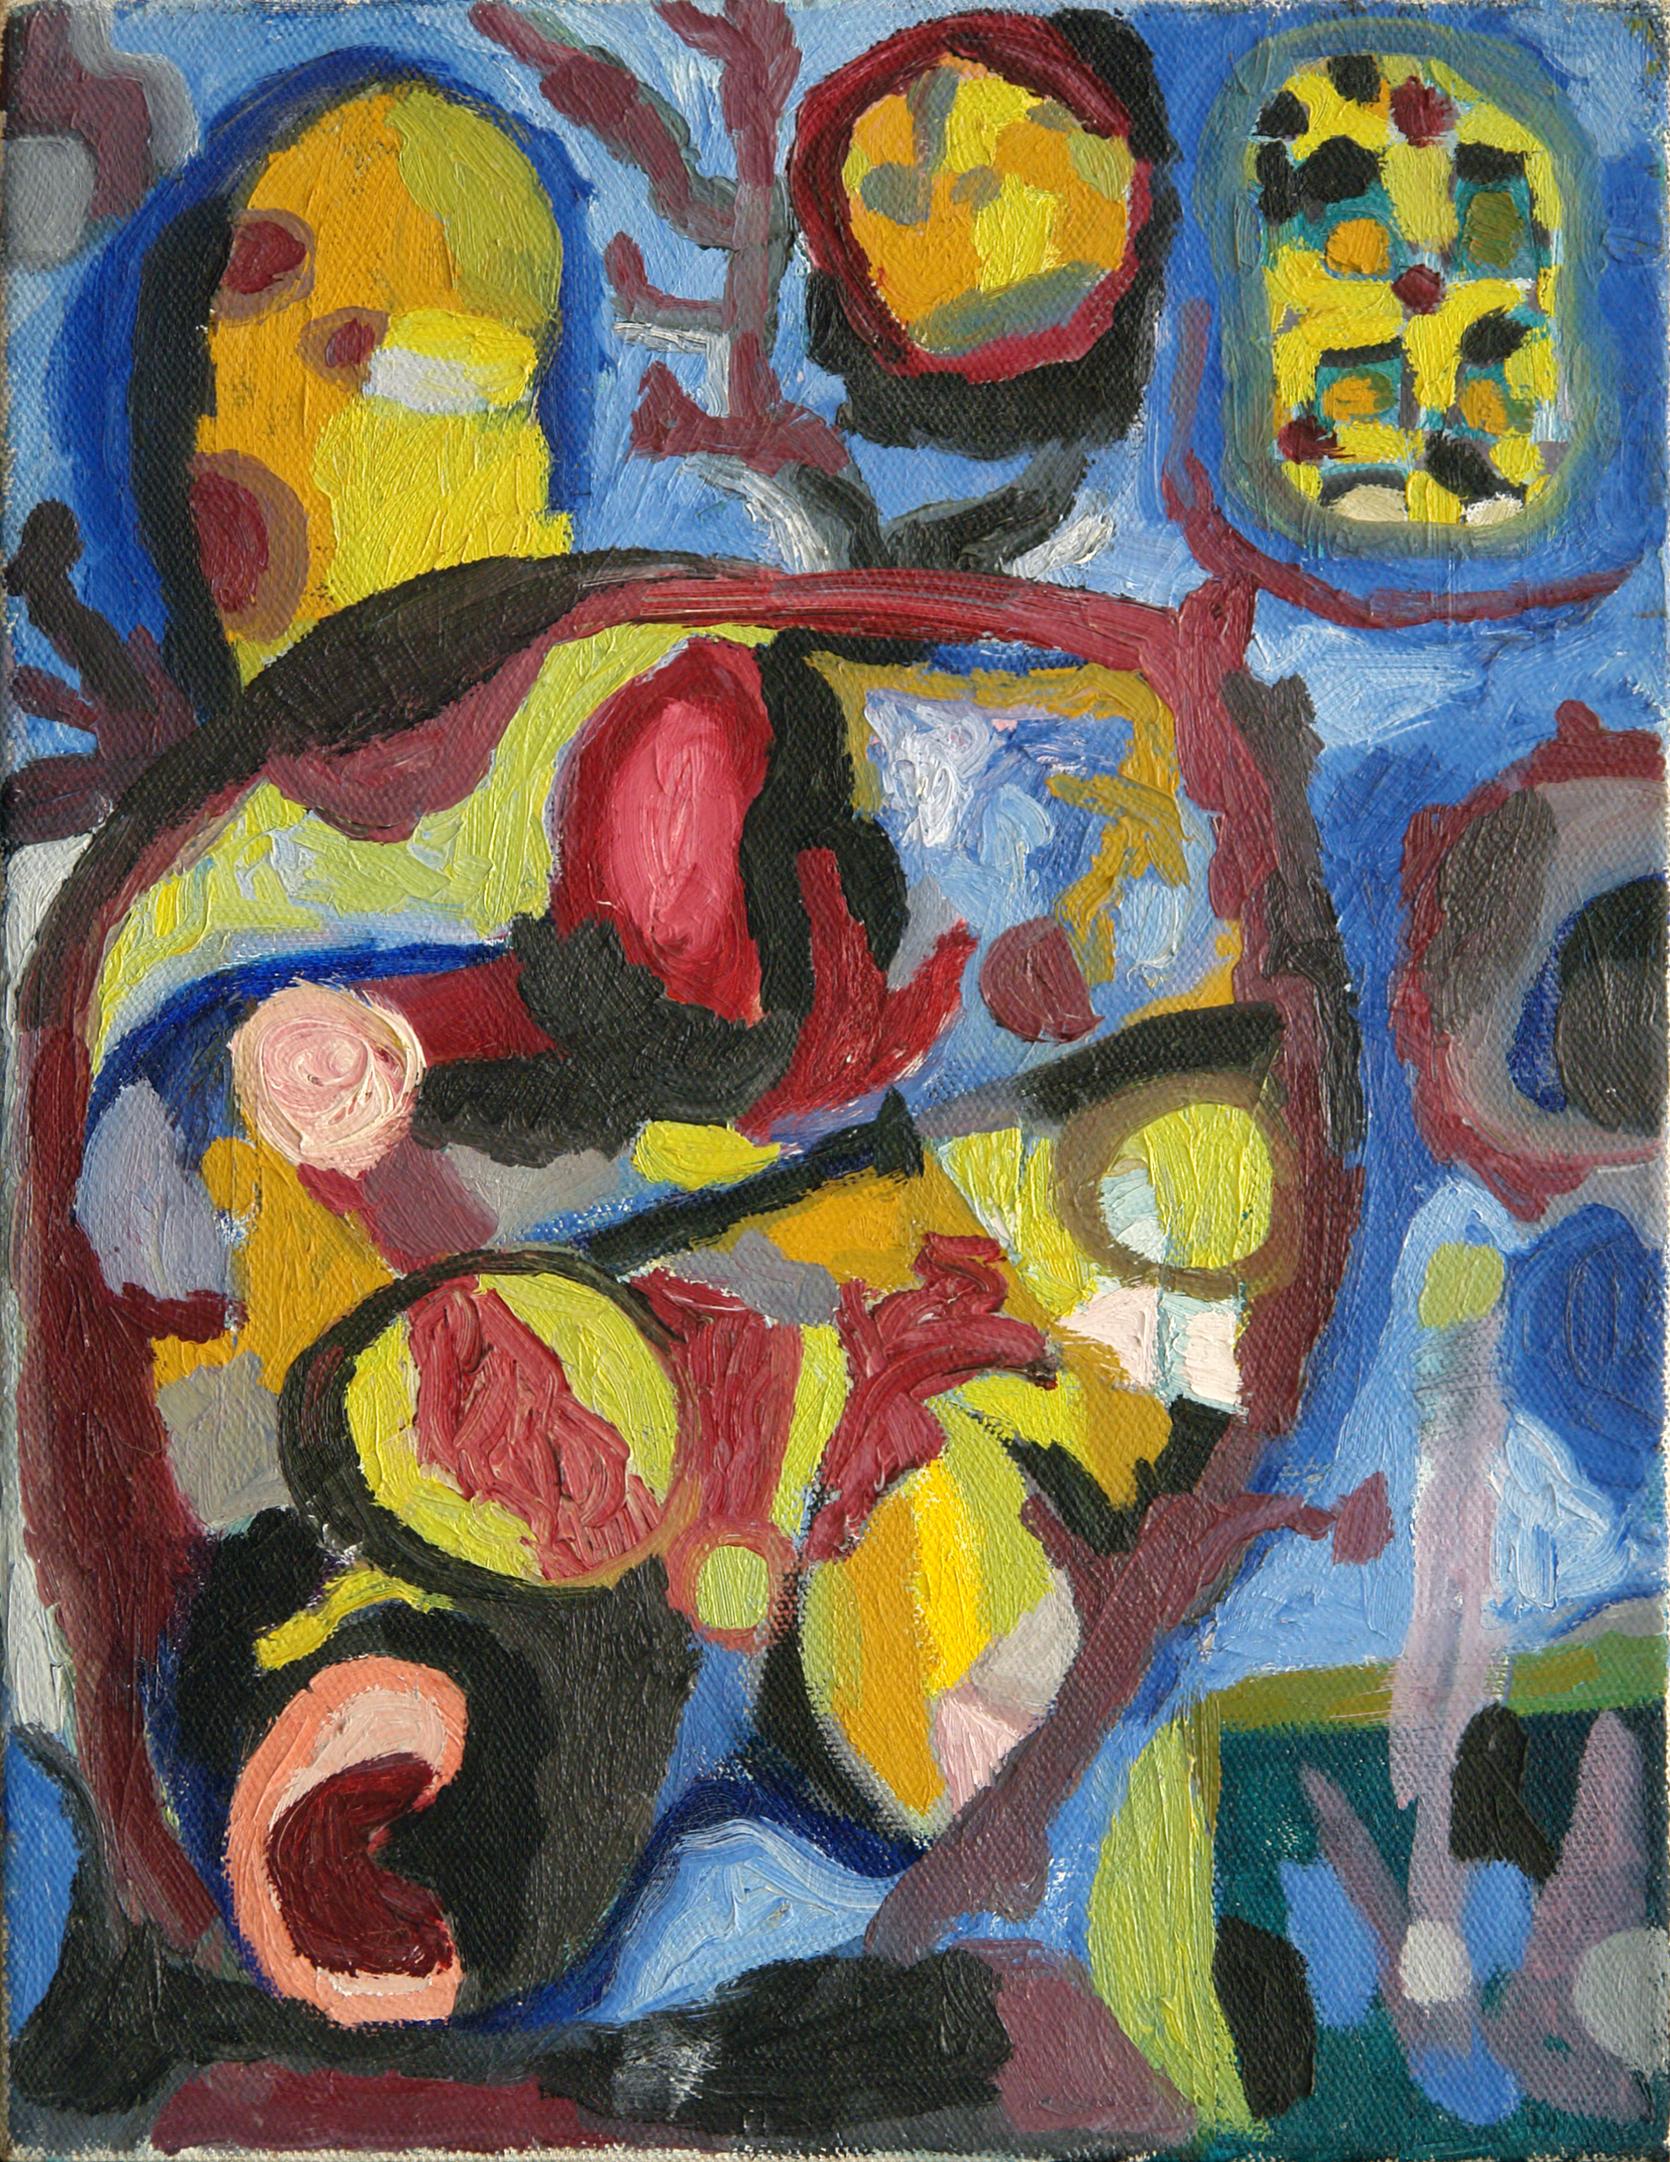 George Lampe - Stilleven Glas (Still Life Glass) - GL207